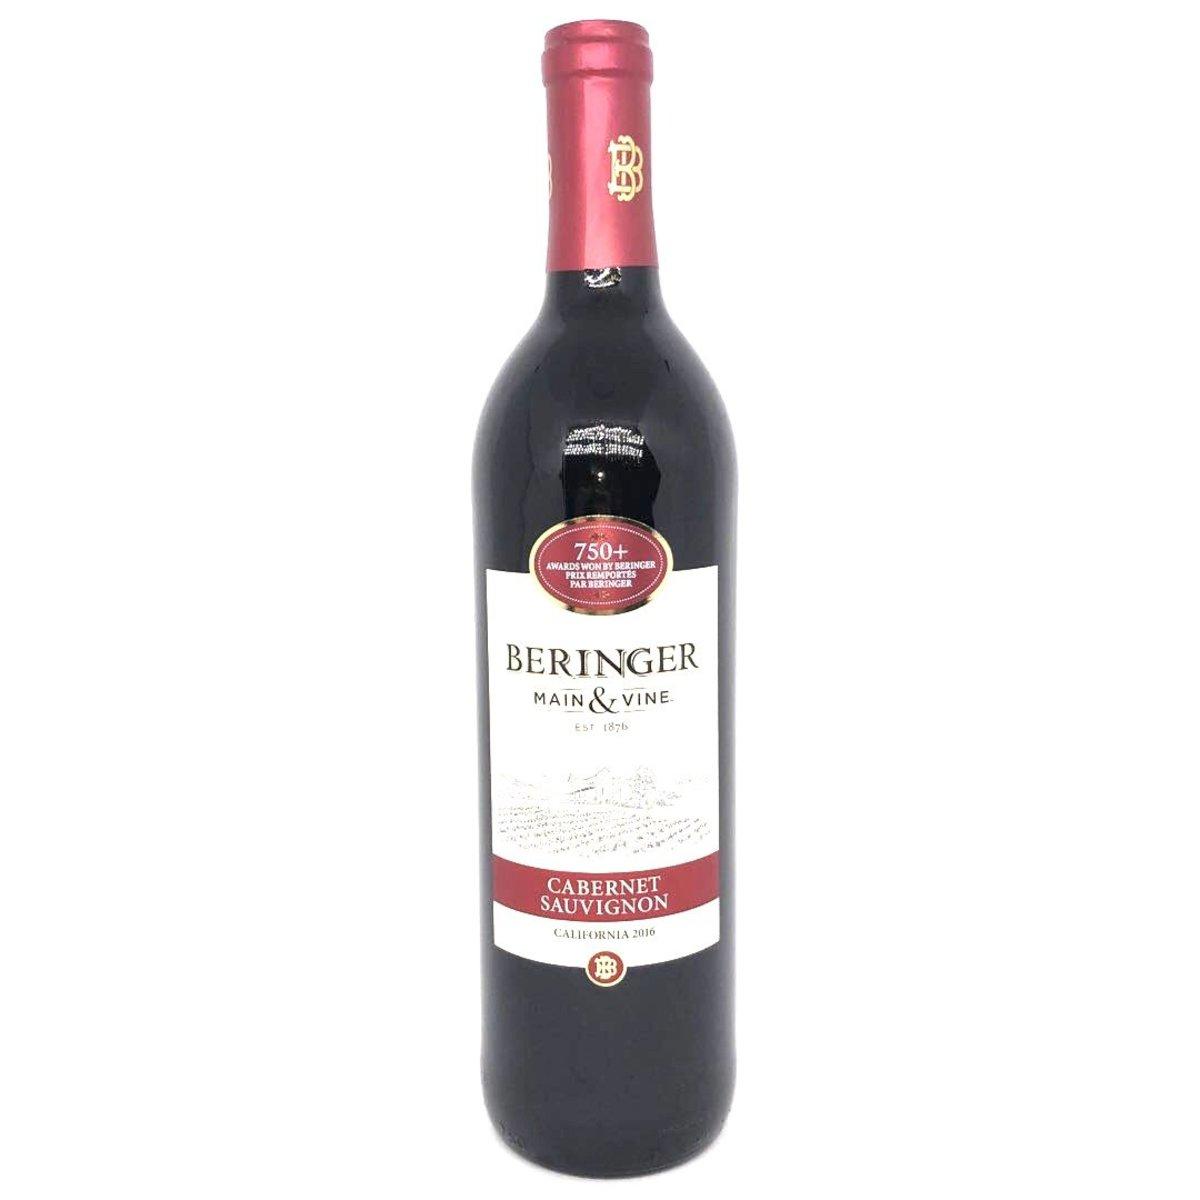 Beringer Vineyards Main & Vine Cabernet Sauvignon, Napa Valley, USA 2016